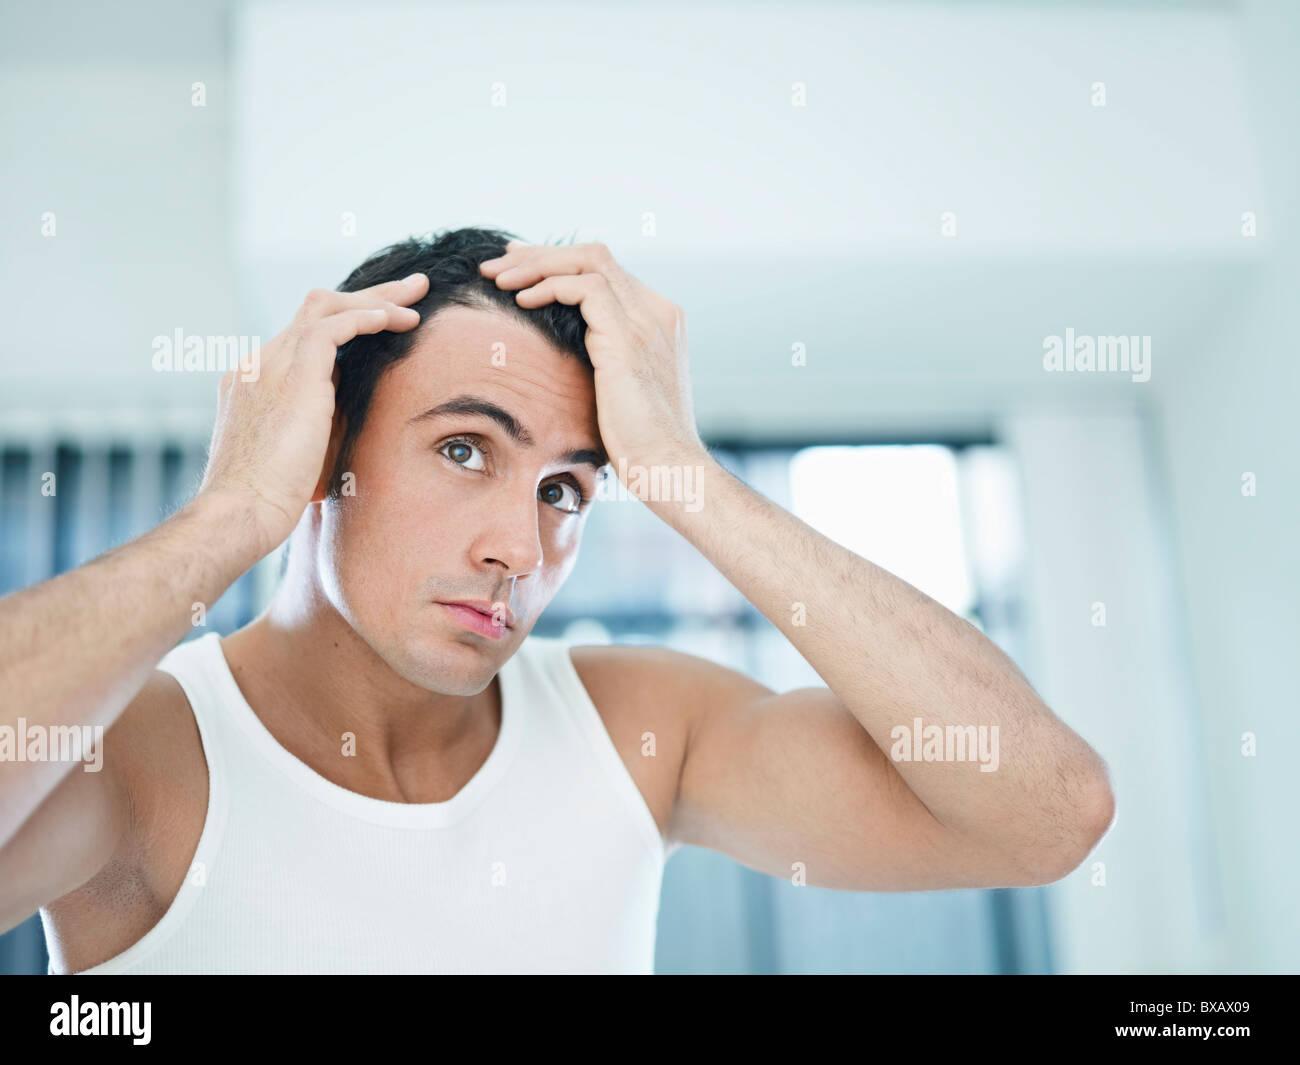 man checking receding hairline - Stock Image